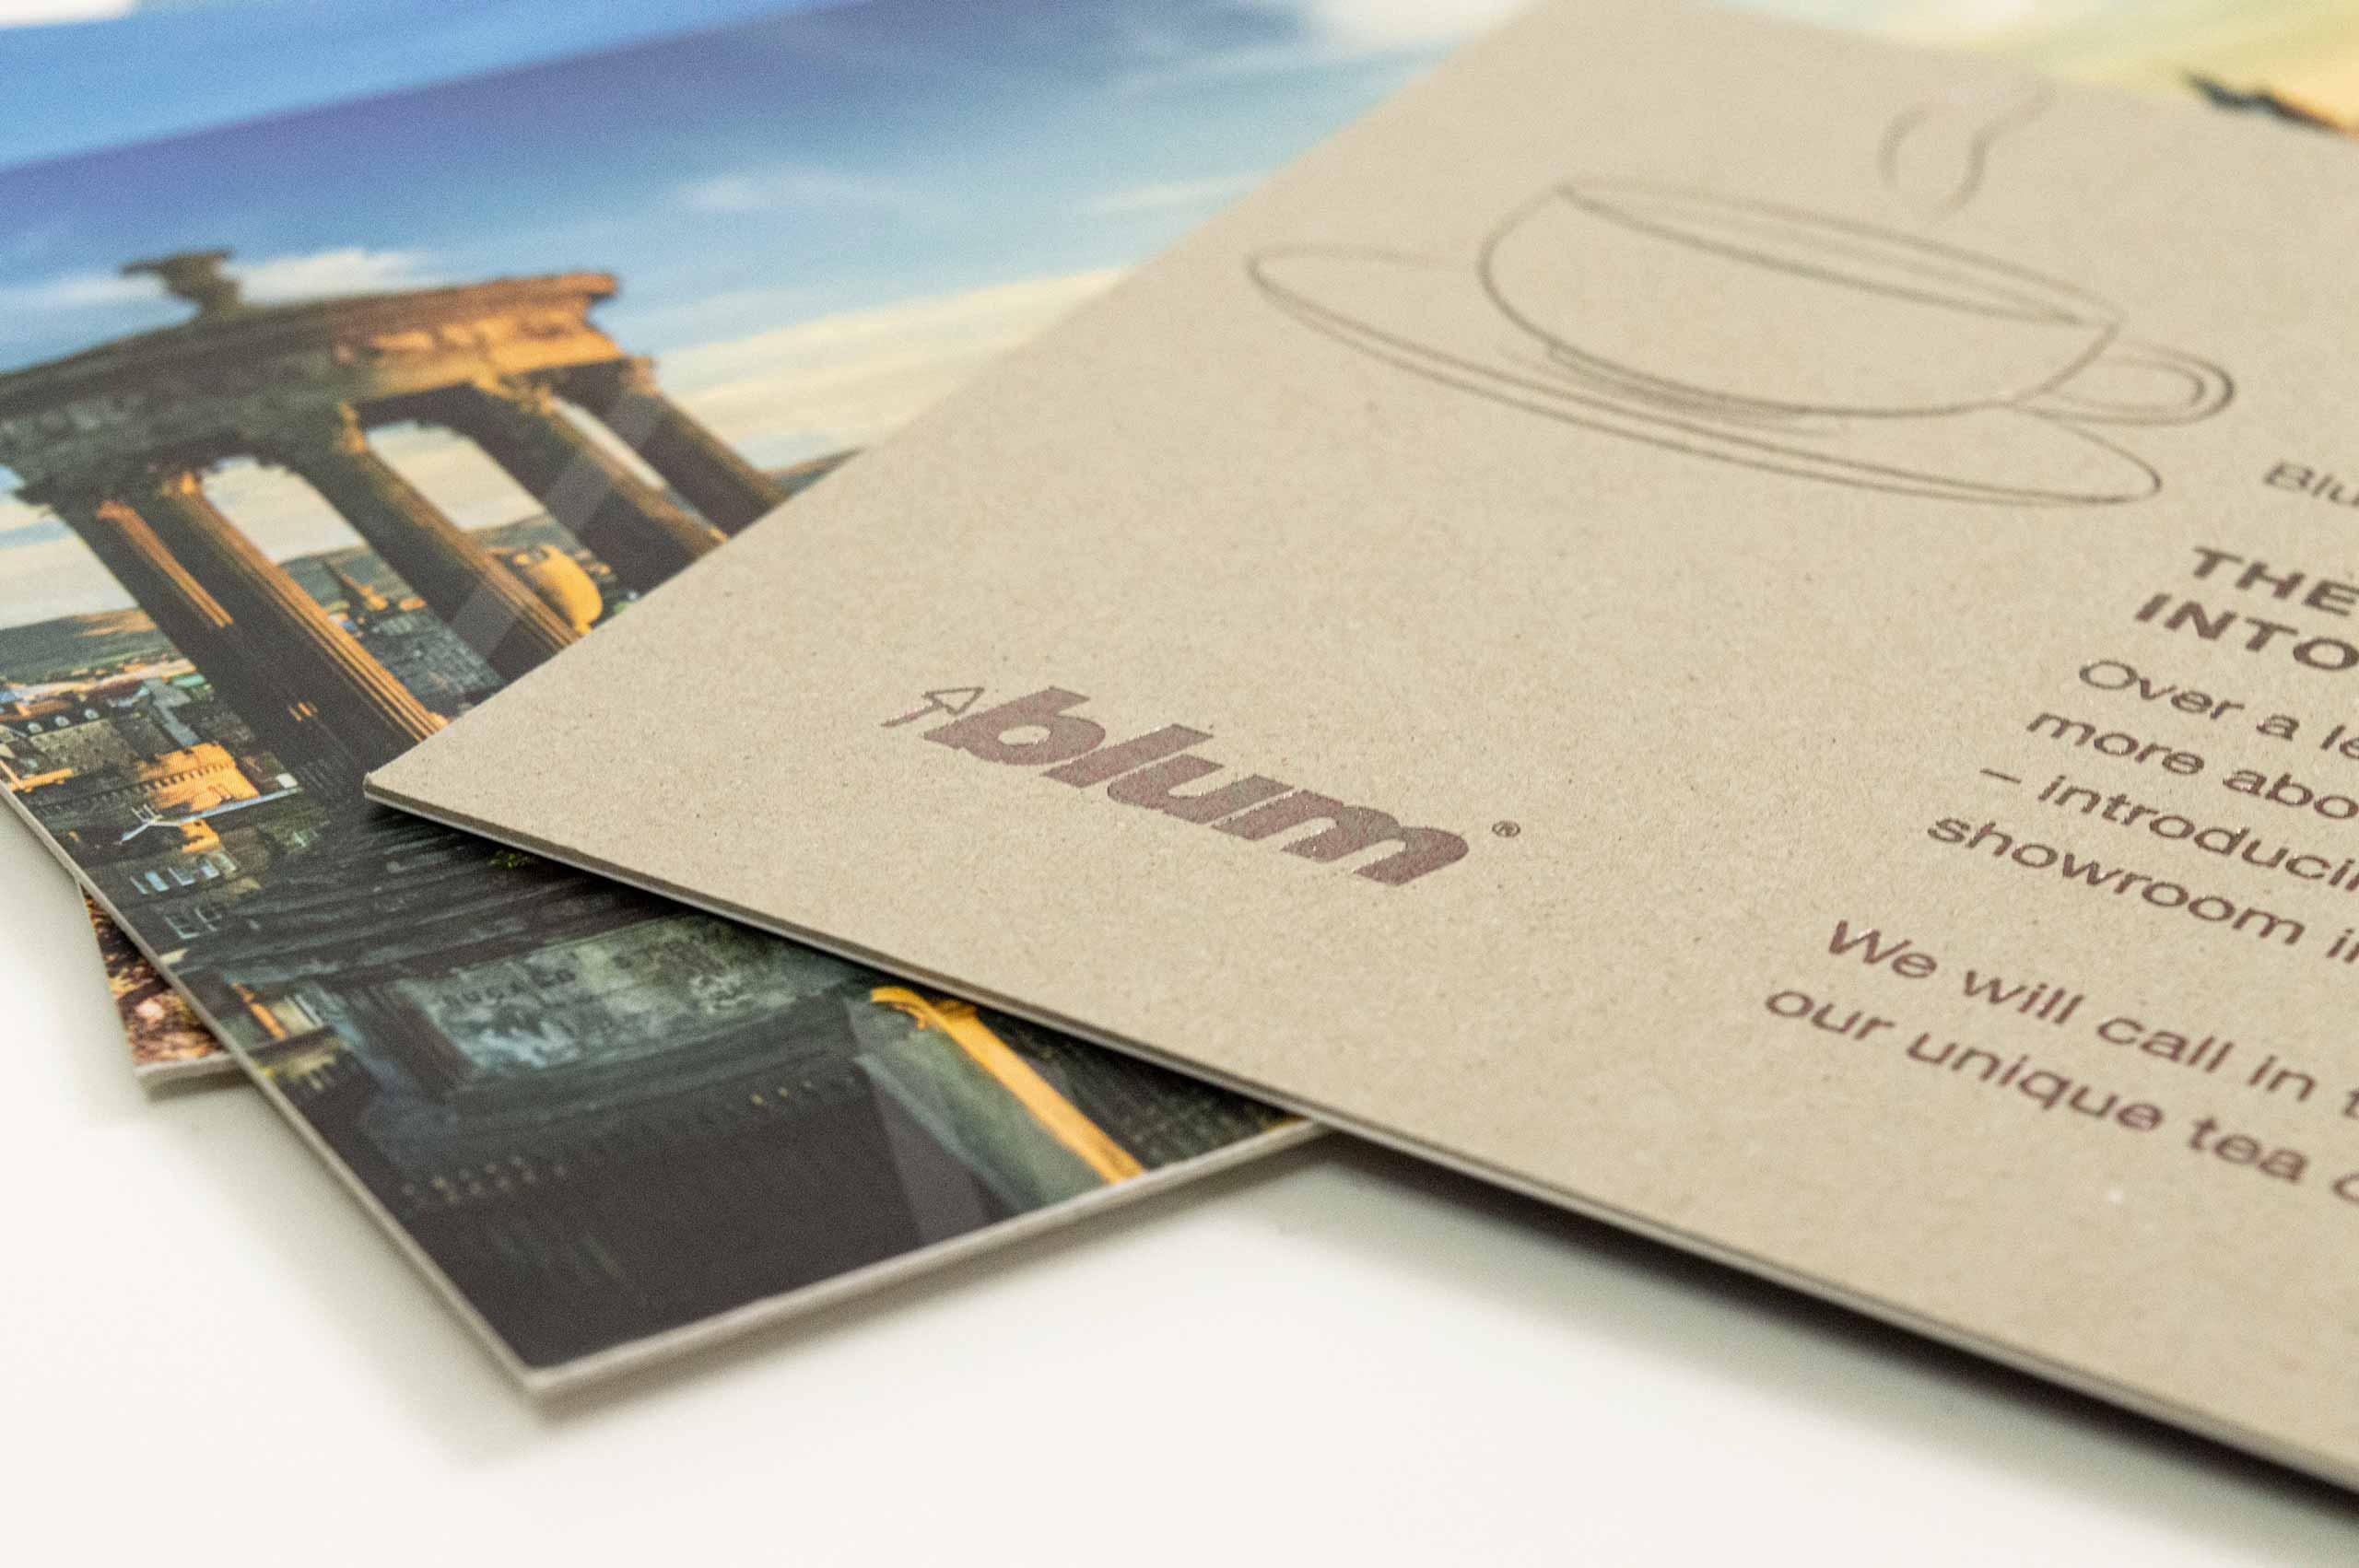 Blum | Space Tower campaign postcard close-up | Zeke Creative